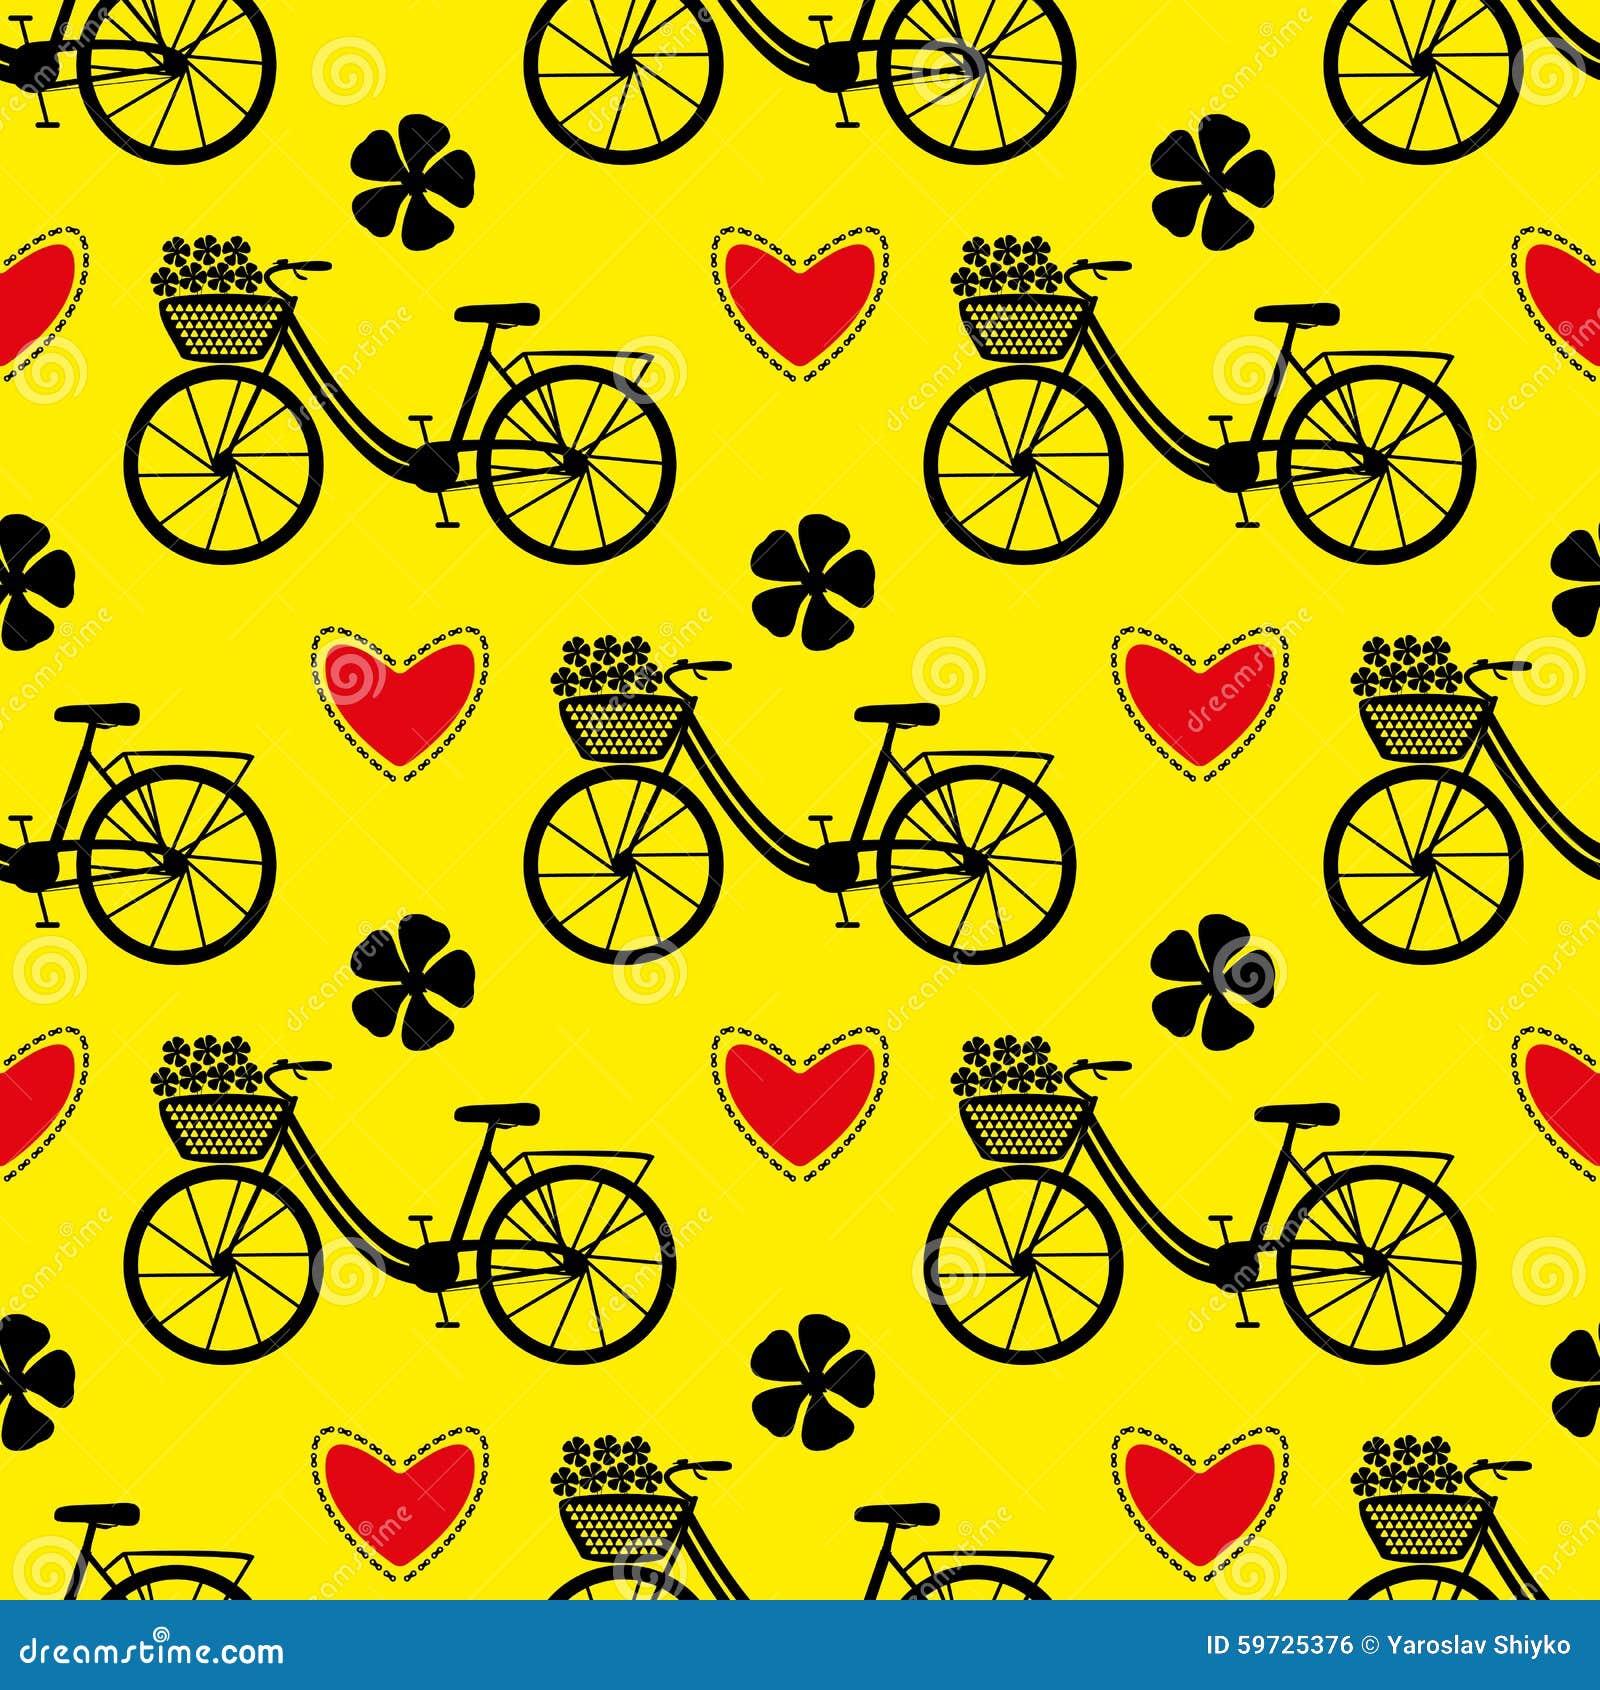 Seamless bicycle pattern.